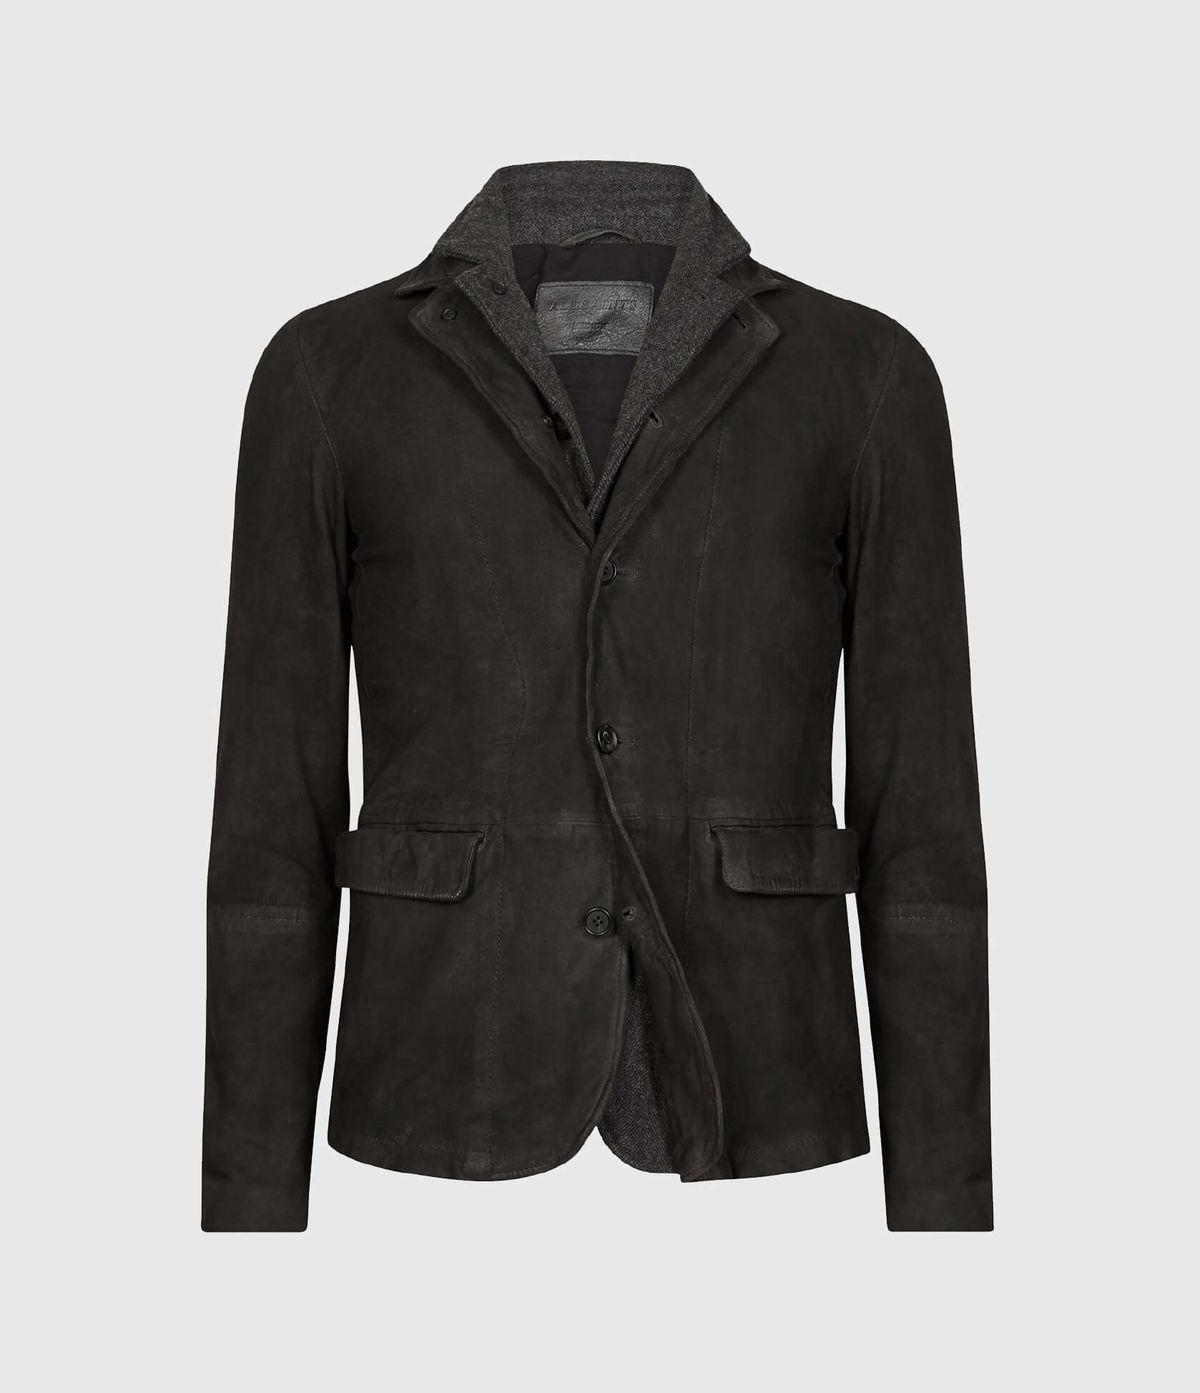 Men's Survey Leather Jacket - Hover for Measurements